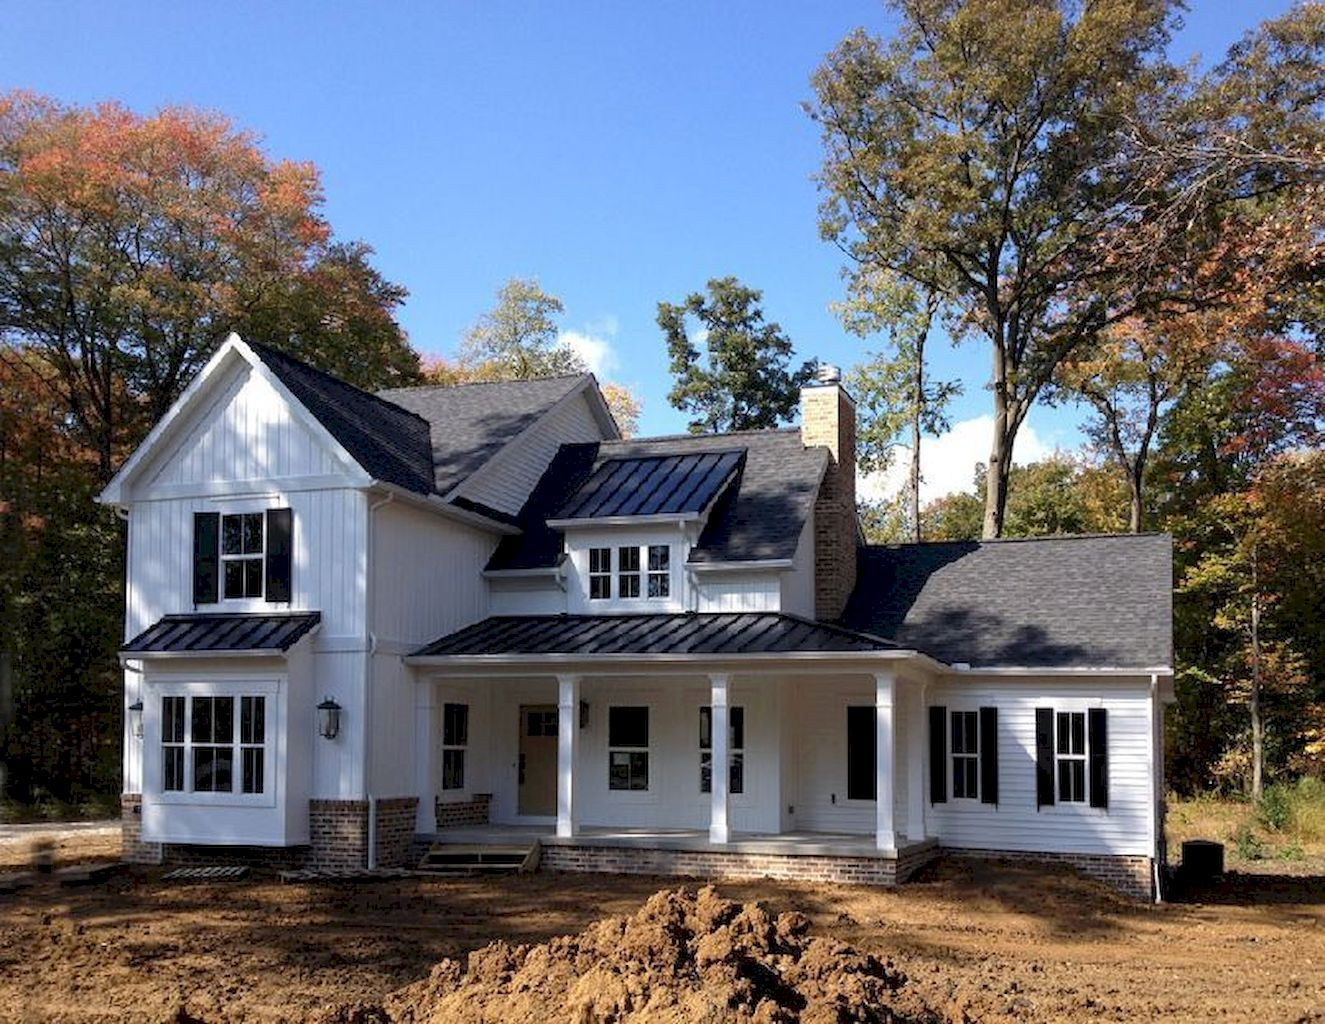 50 rustic farmhouse exterior design ideas | rustic farmhouse